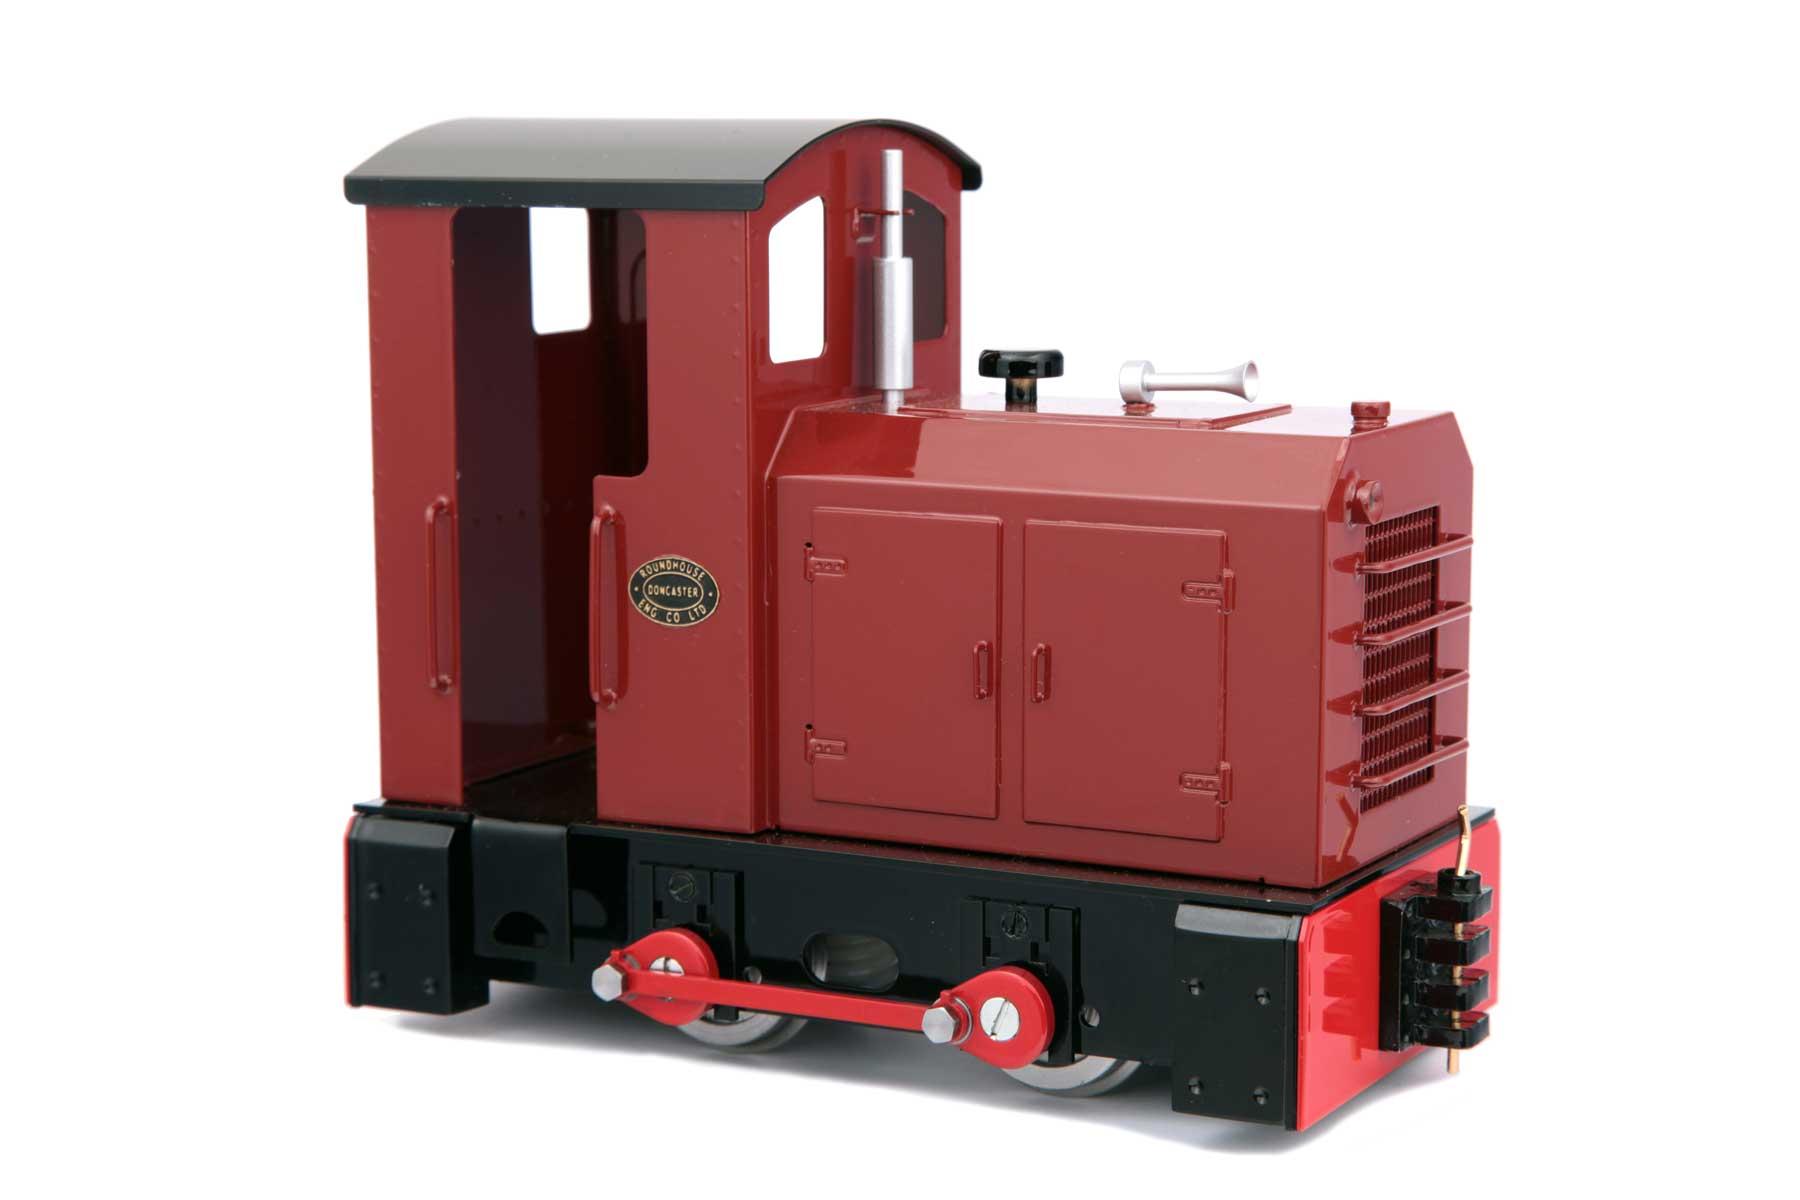 test bulldog Diesel locomotive for sale 02